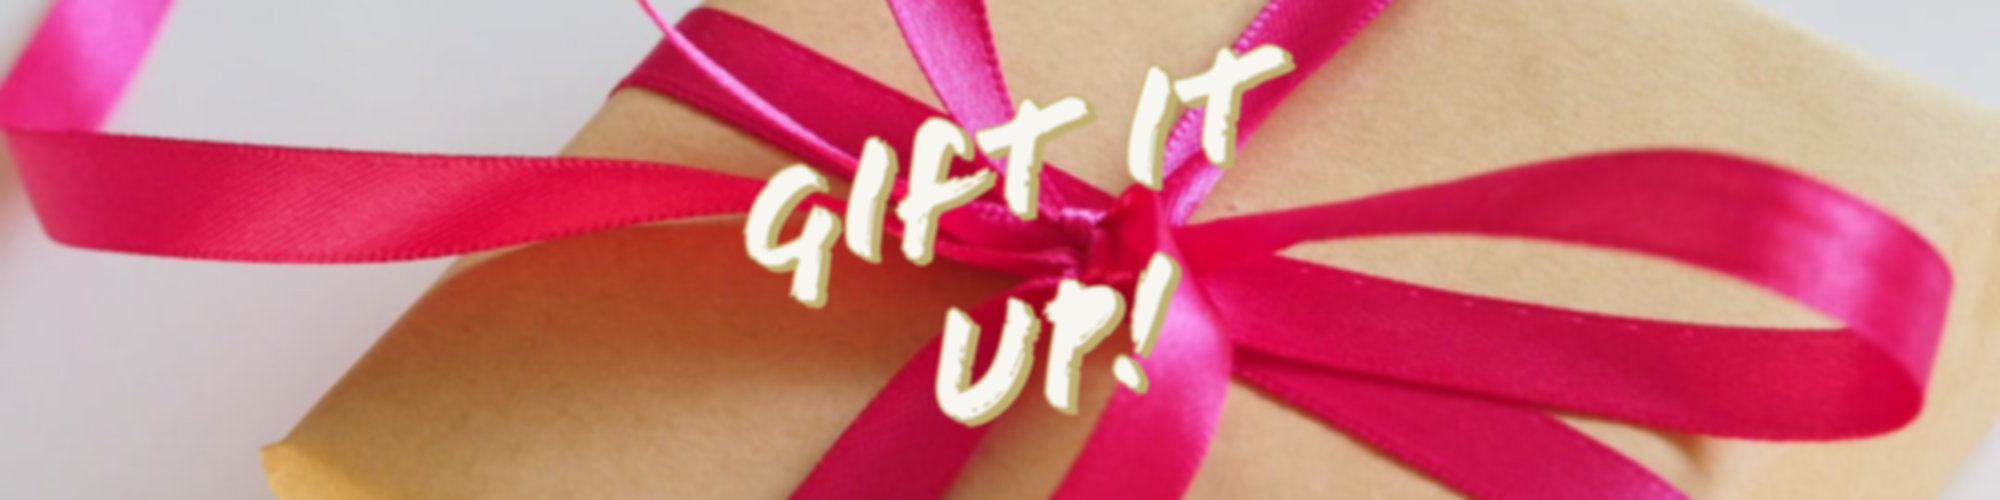 Gift Sets.jpg